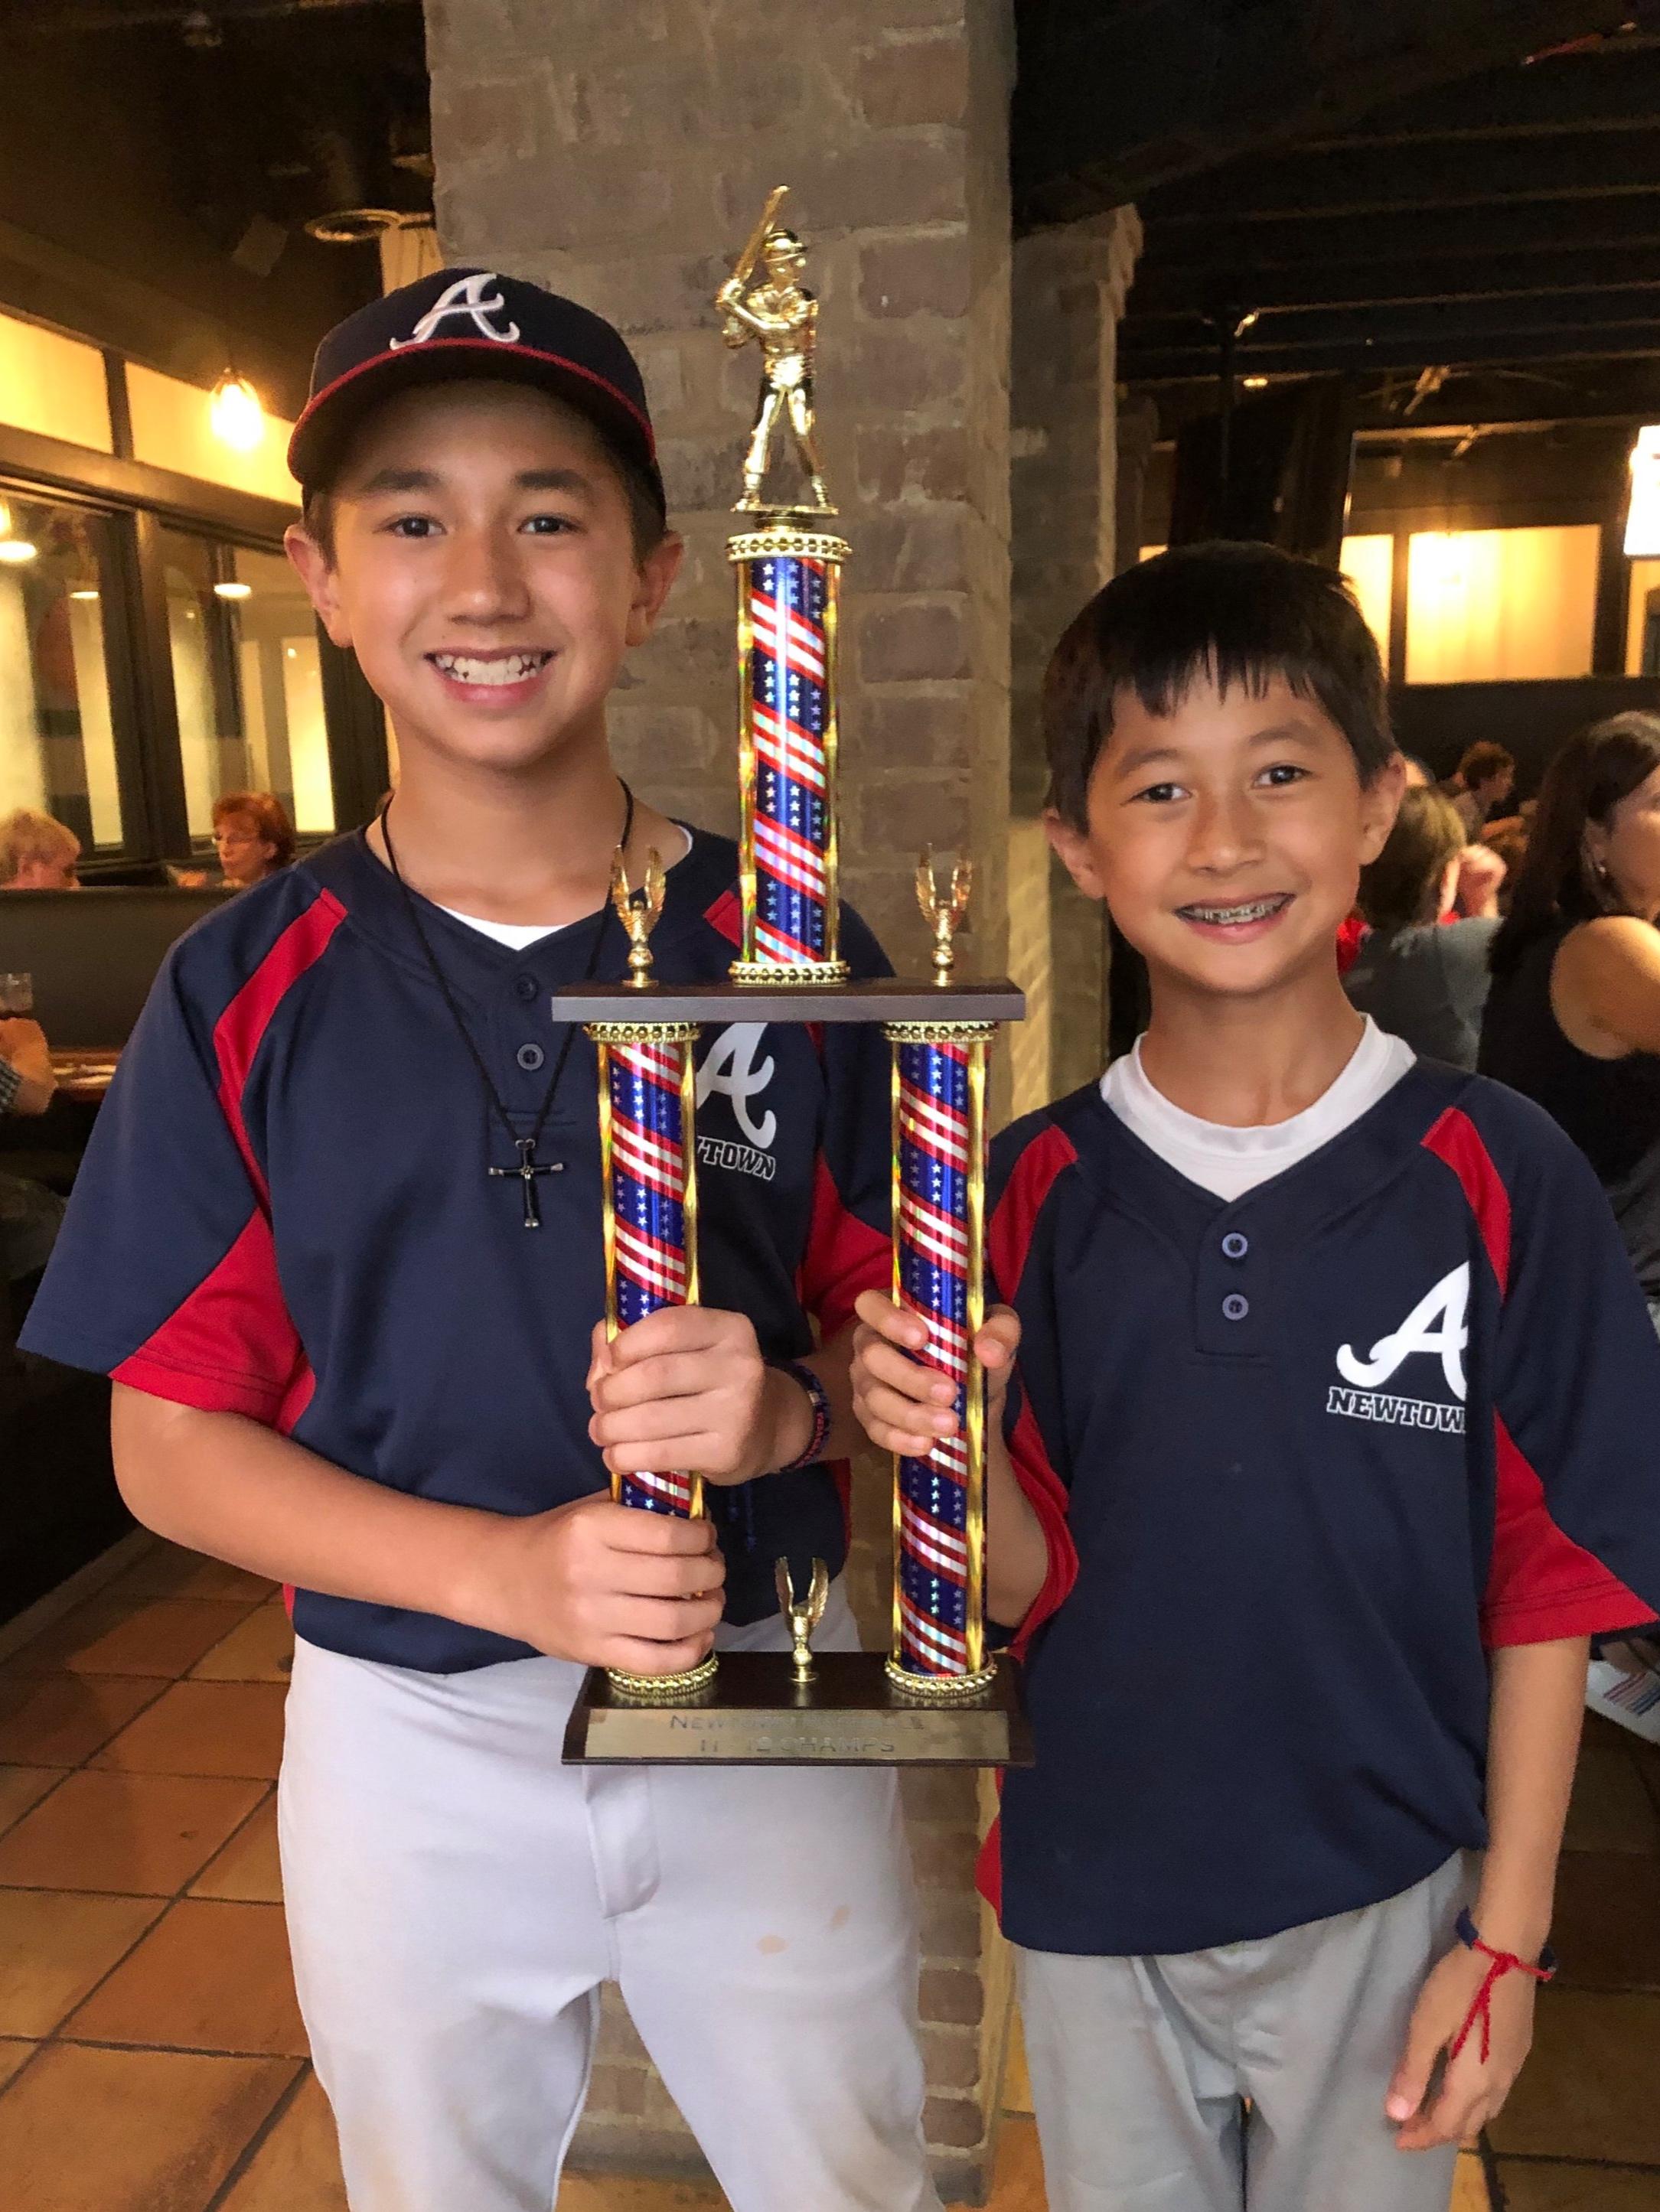 Champions Landon and Ryan